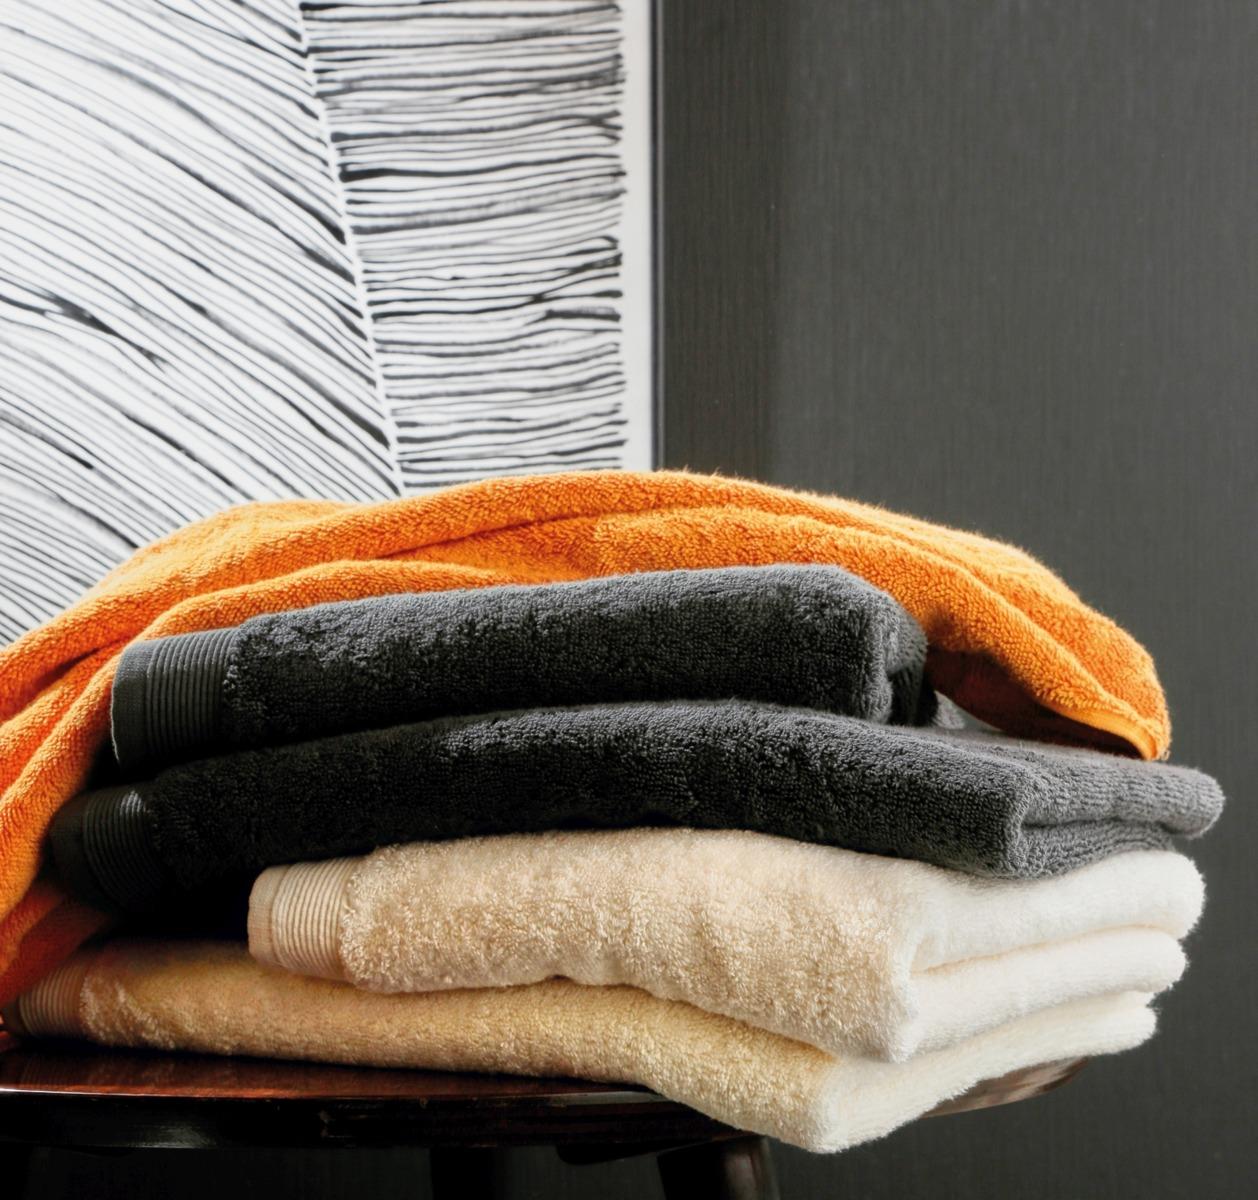 r cznik blanc des vosges uni pomara czowy r cznik sklep online podpierzyn com. Black Bedroom Furniture Sets. Home Design Ideas